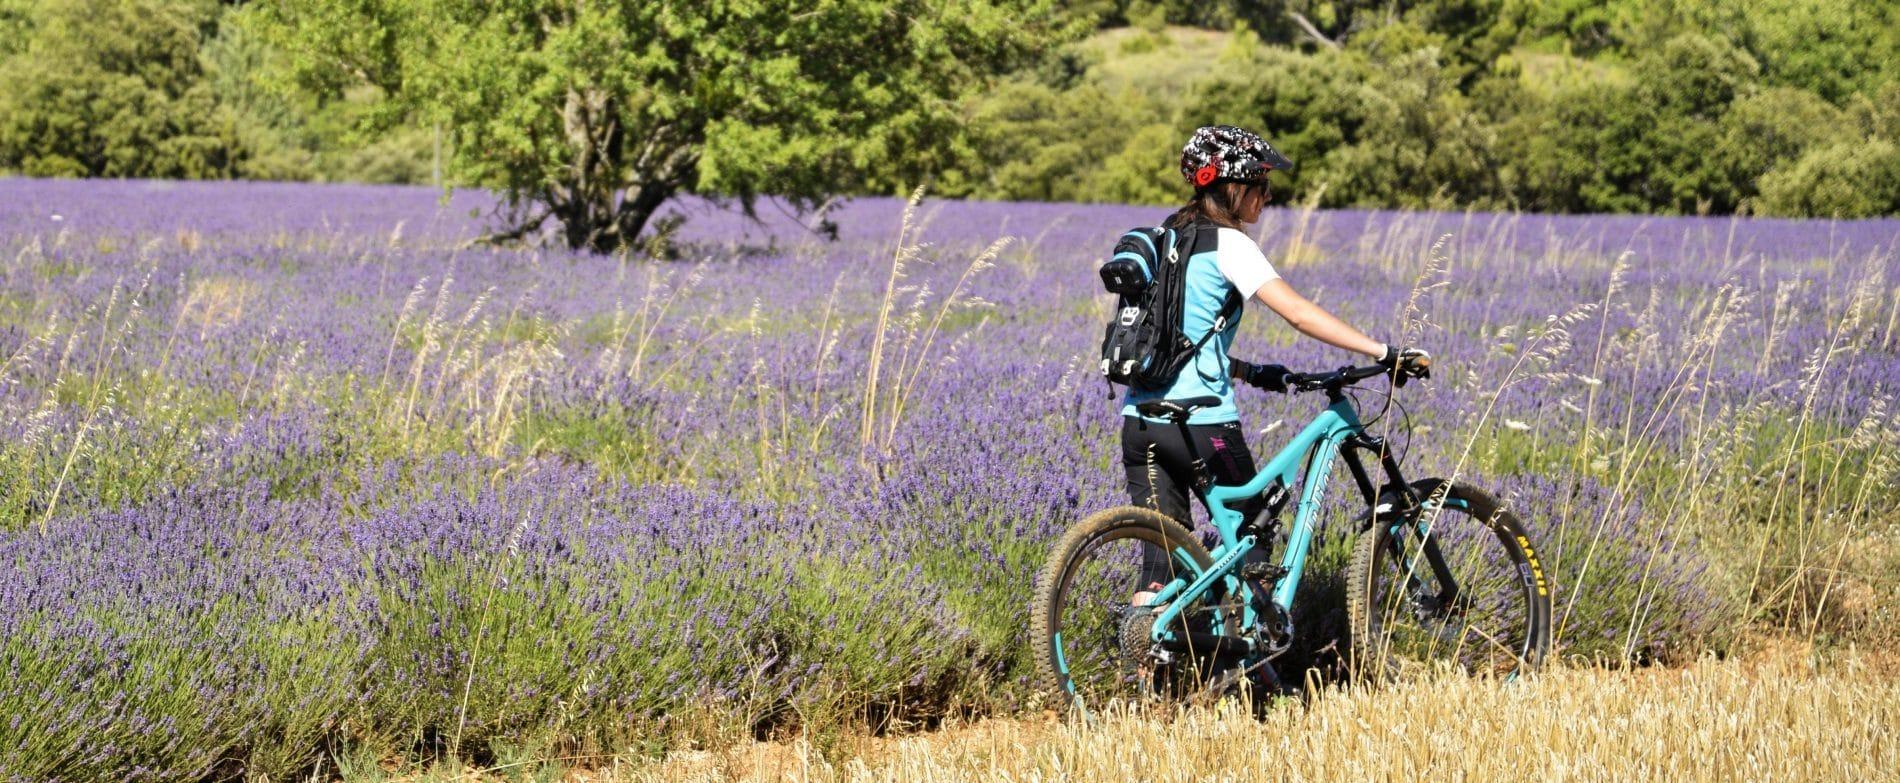 test VTT femme juliana Roubion 2015 descente enduro lavande